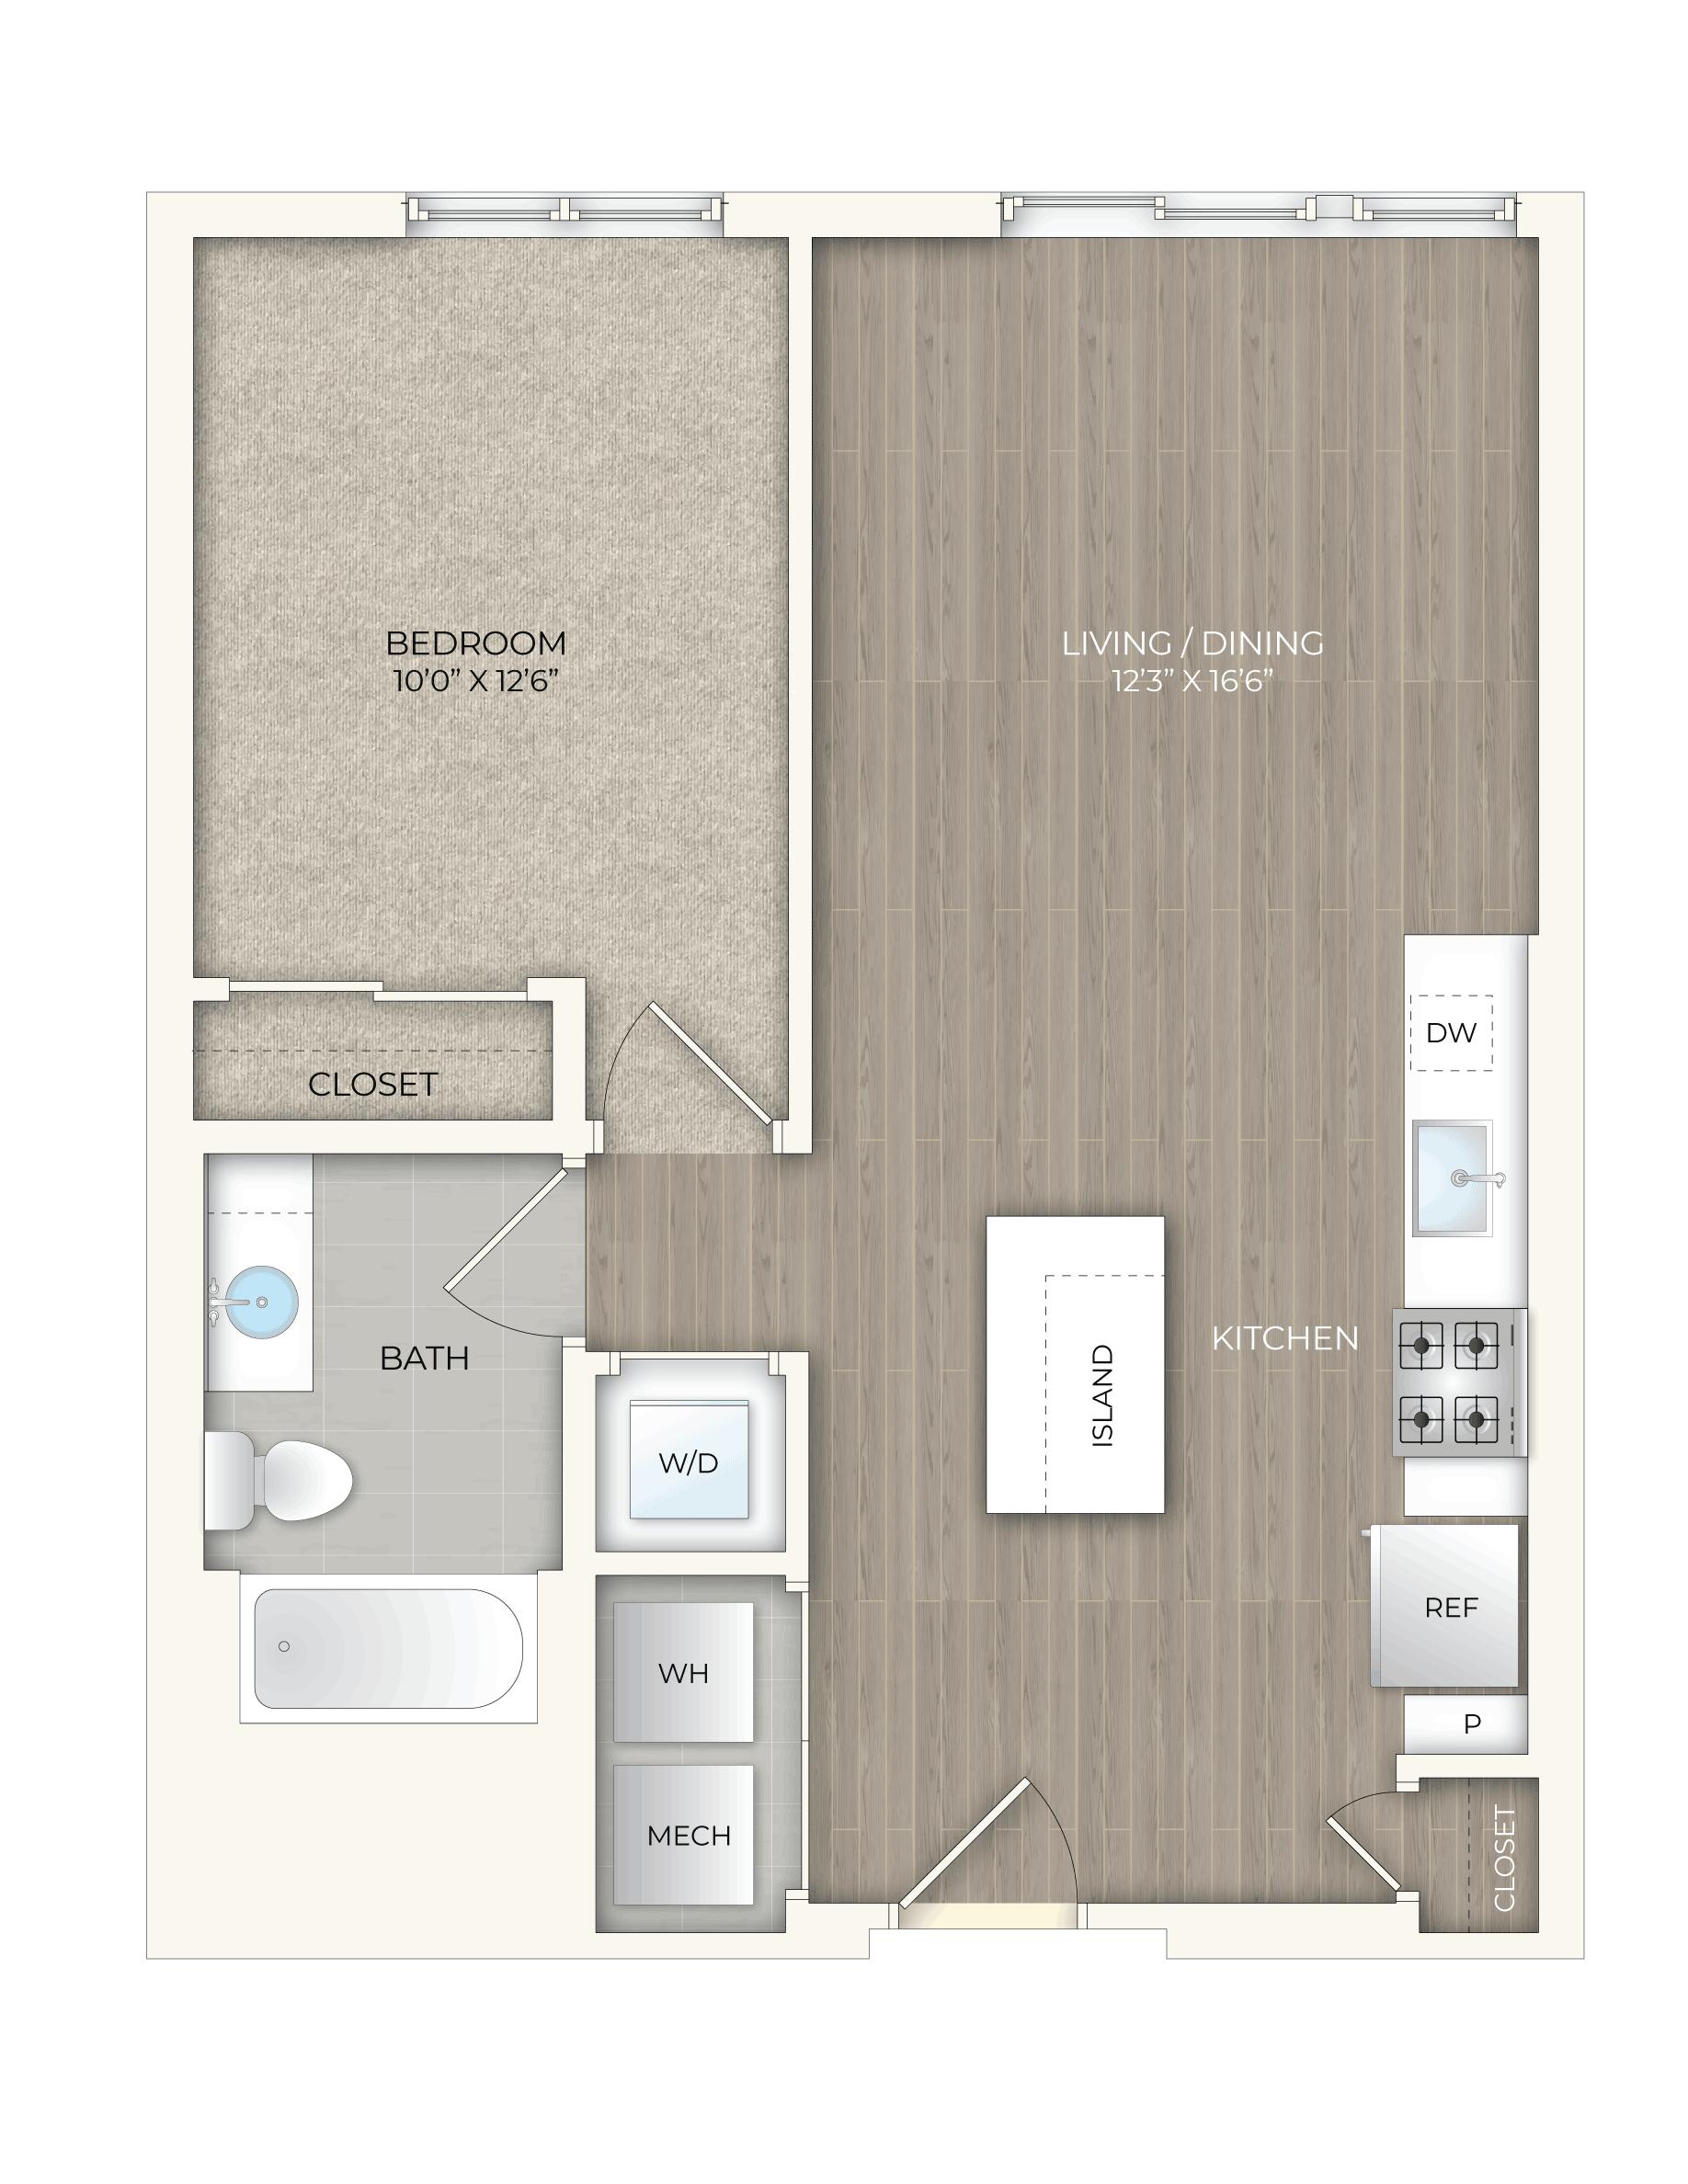 floor plan image of apartment 541